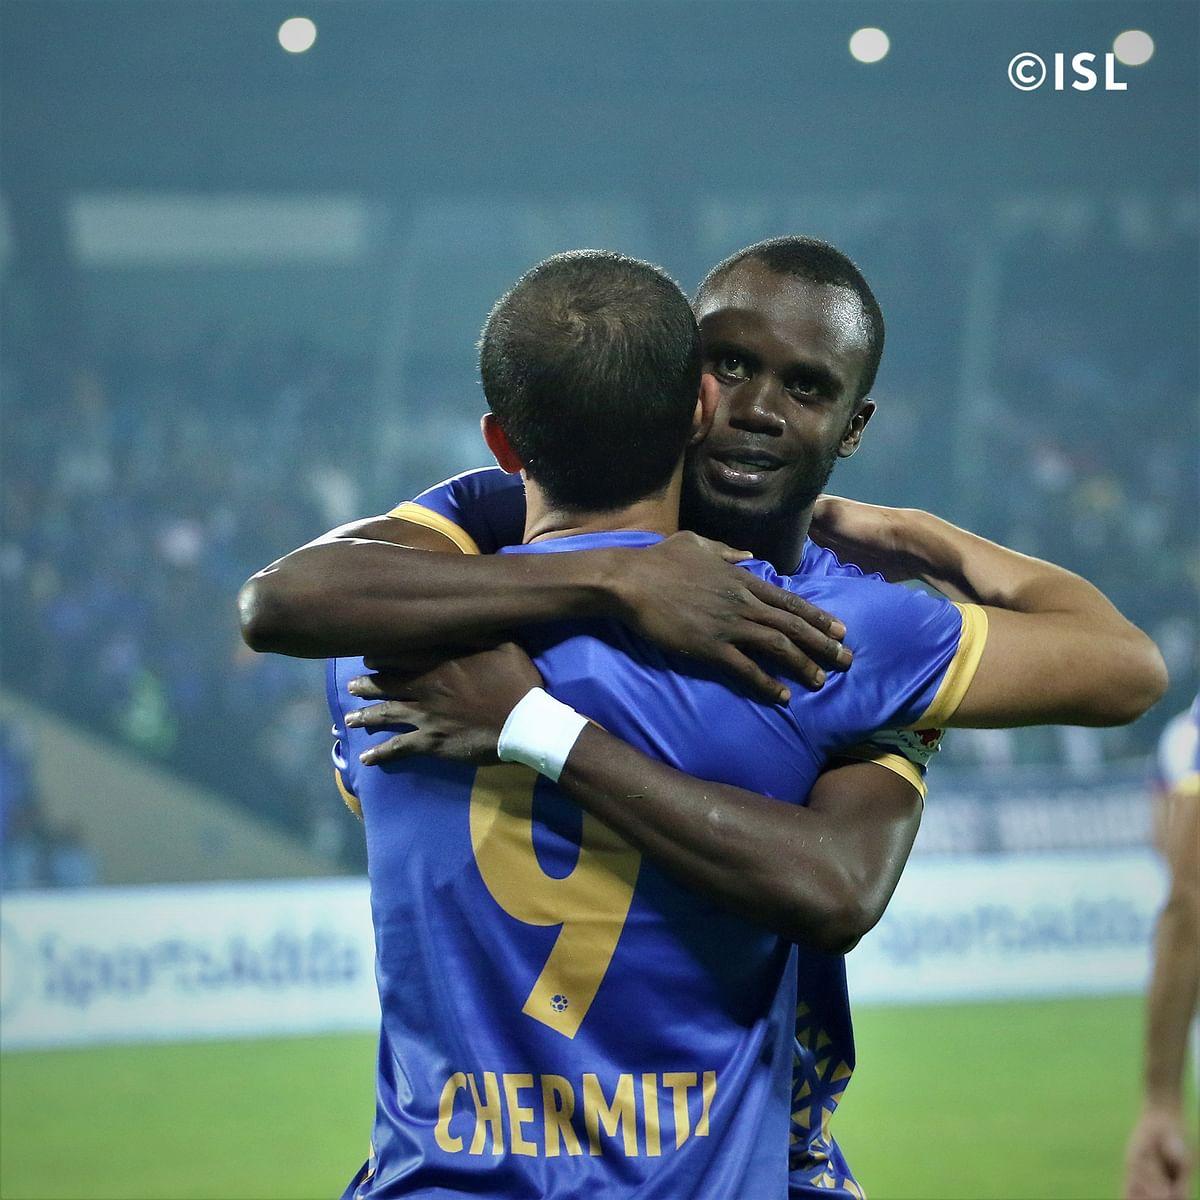 ISL: Mumbai City FC's supremacy intact